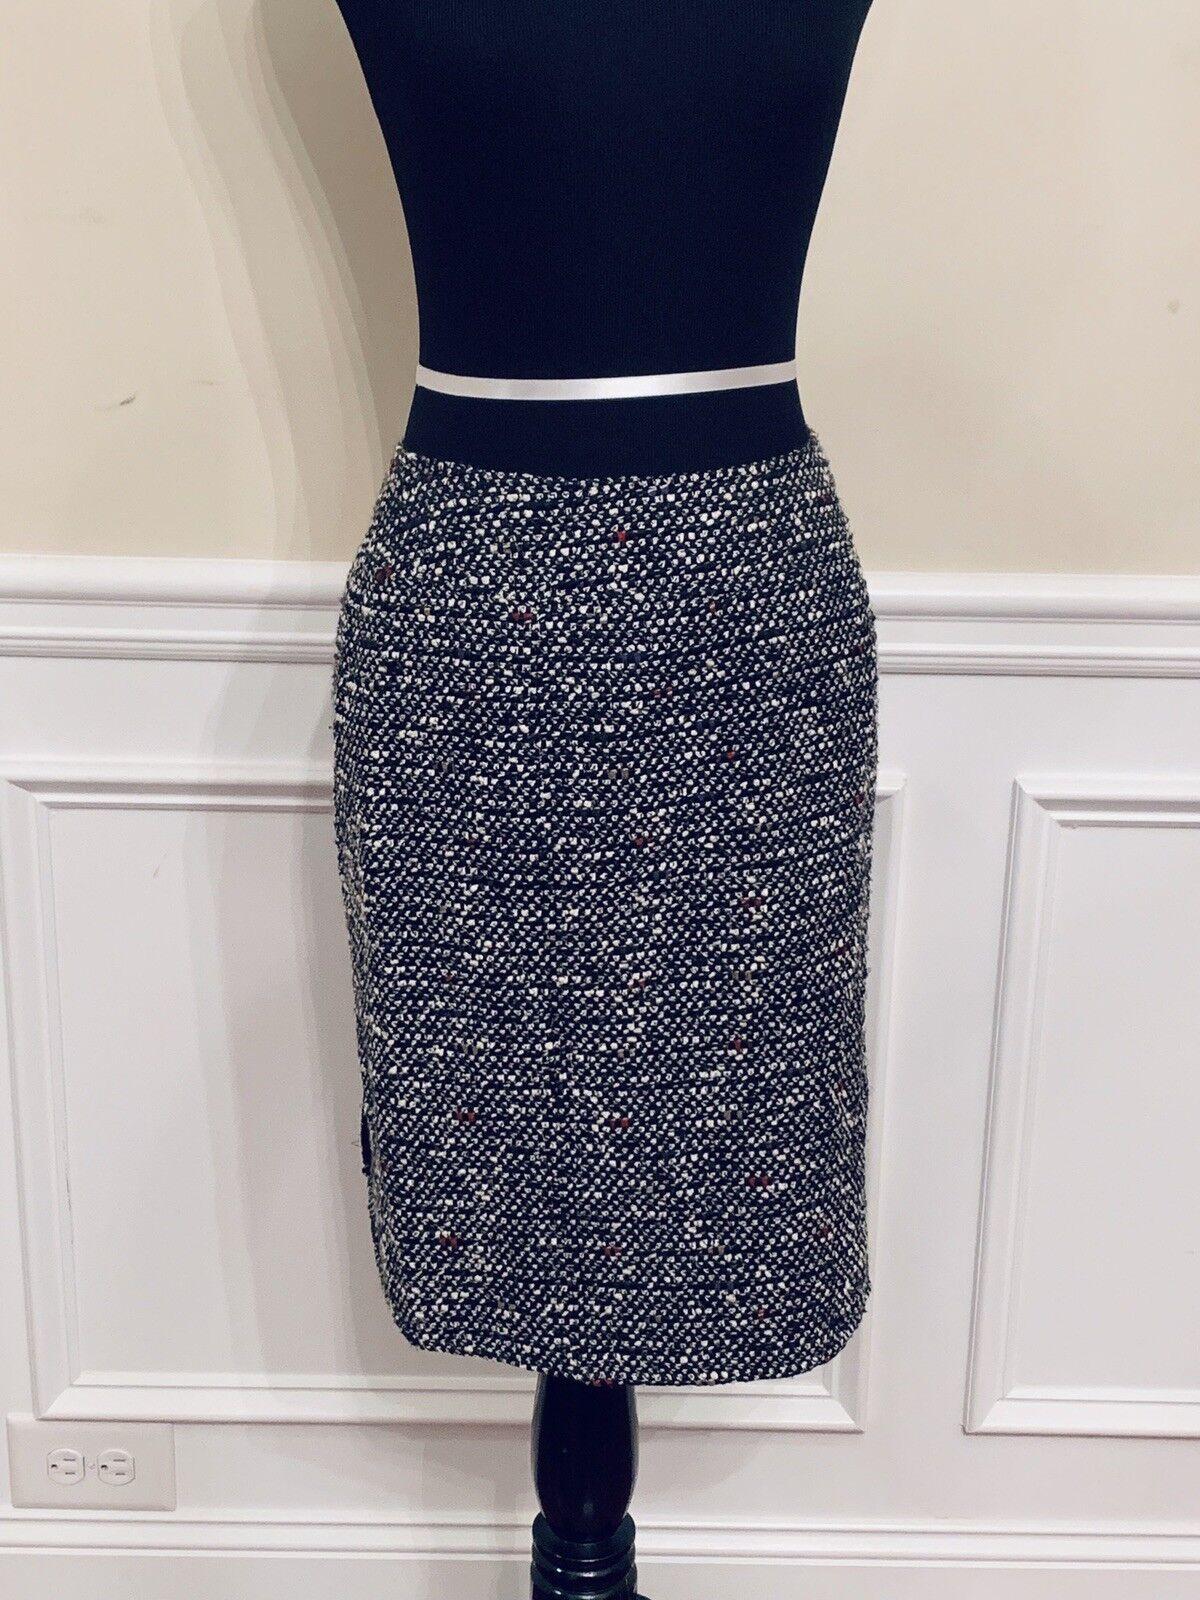 NEW Lafayette 148 New York bluee Tweed Wool Blend Pencil Skirt Size Petite 2